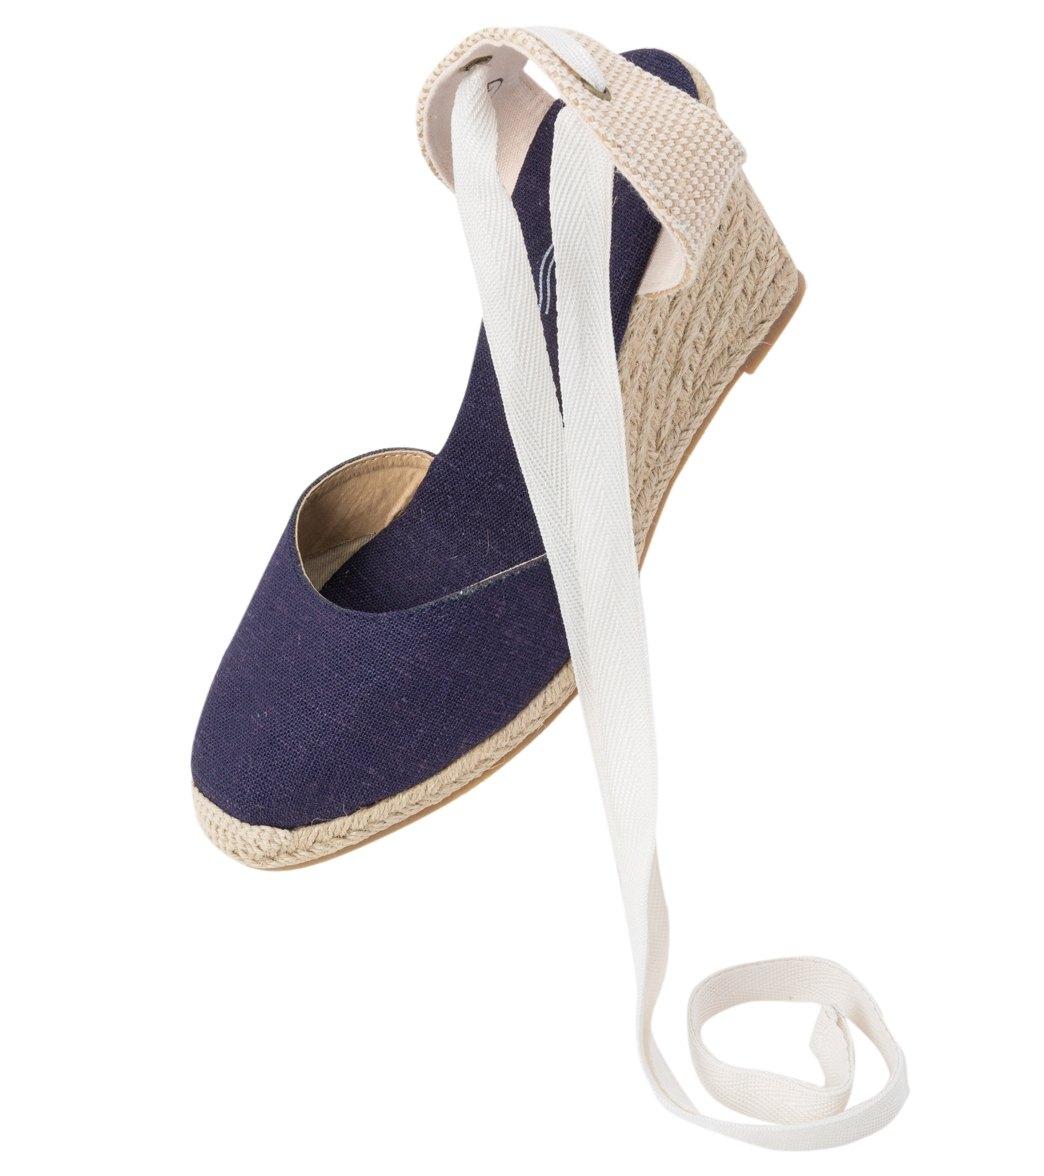 87070e29a95 Soludos Women s Navy Linen Tall Wedge Sandal at SwimOutlet.com ...